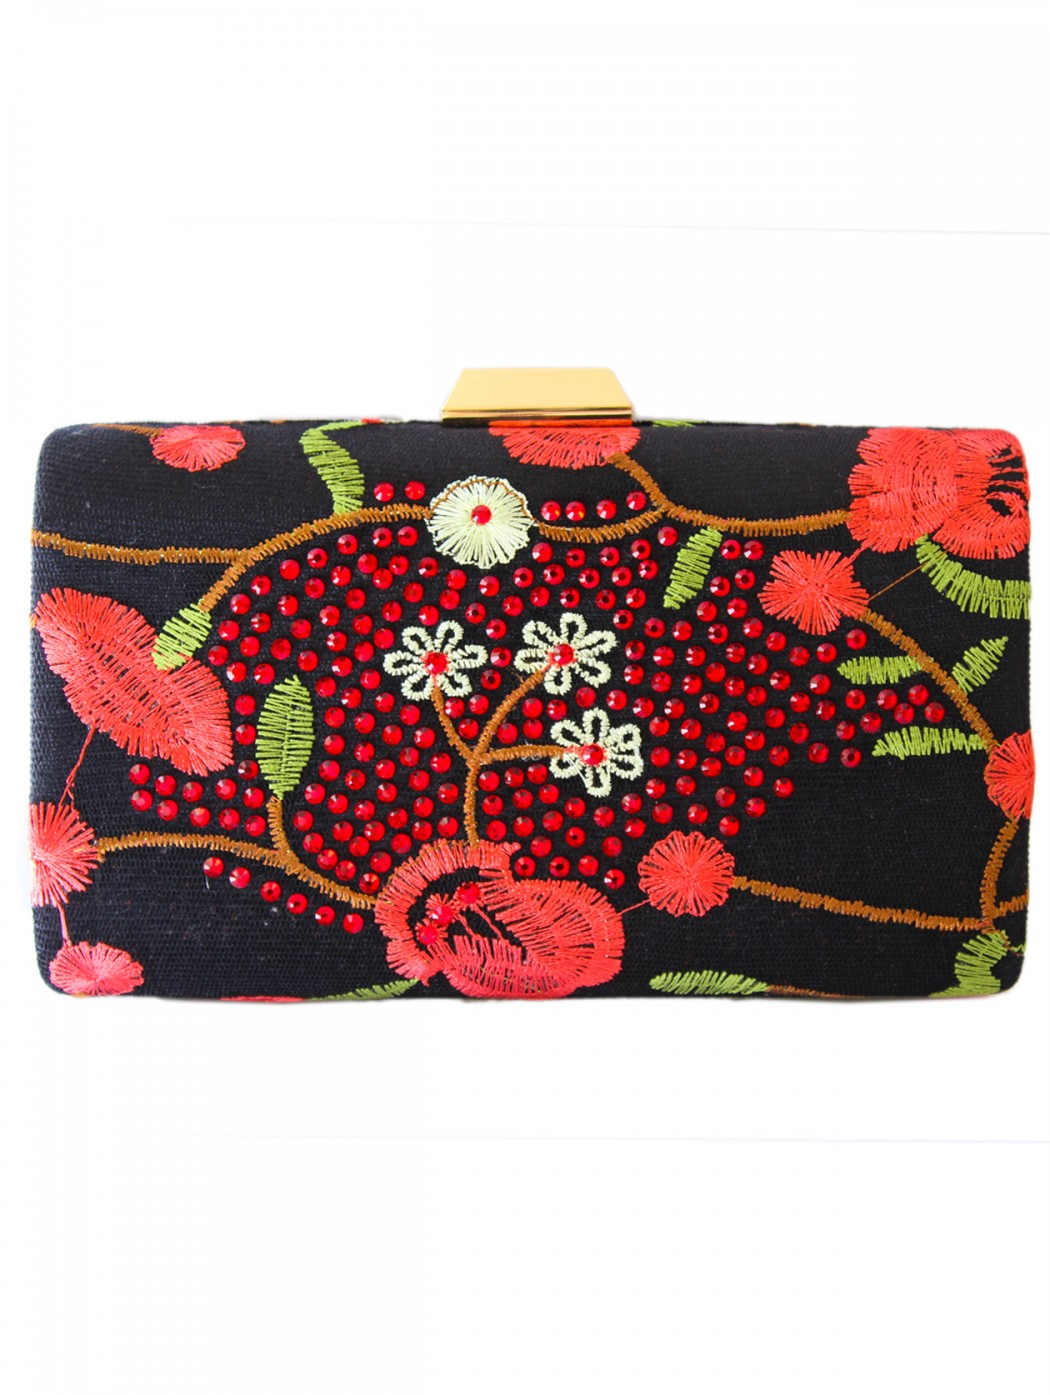 Anna Cecere embroidered...